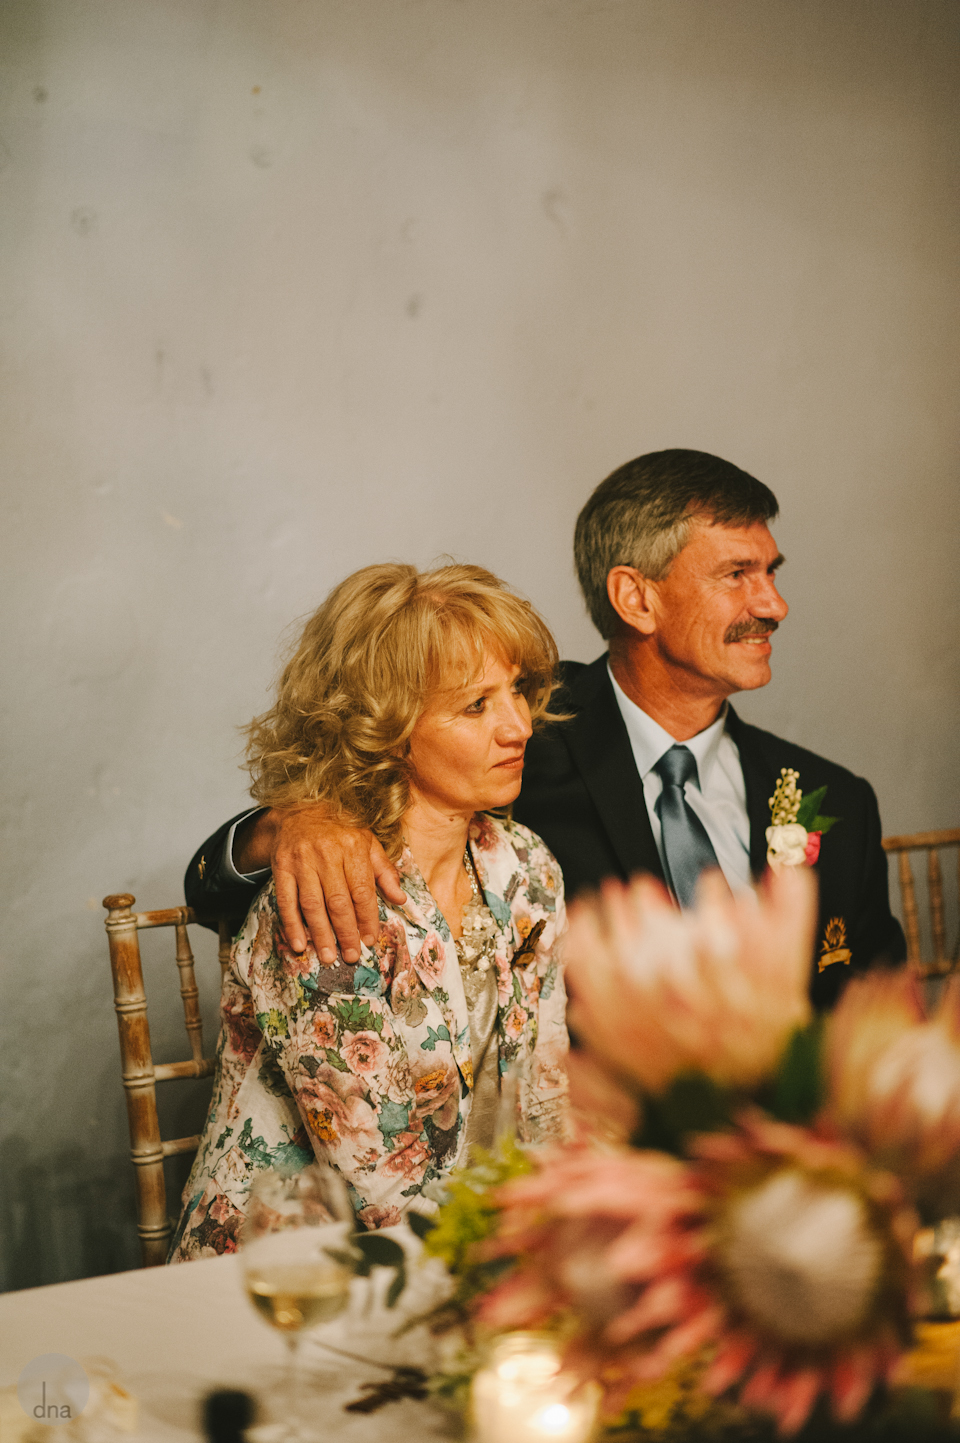 Amy and Marnus wedding Hawksmore House Stellenbosch South Africa shot by dna photographers_-1076.jpg